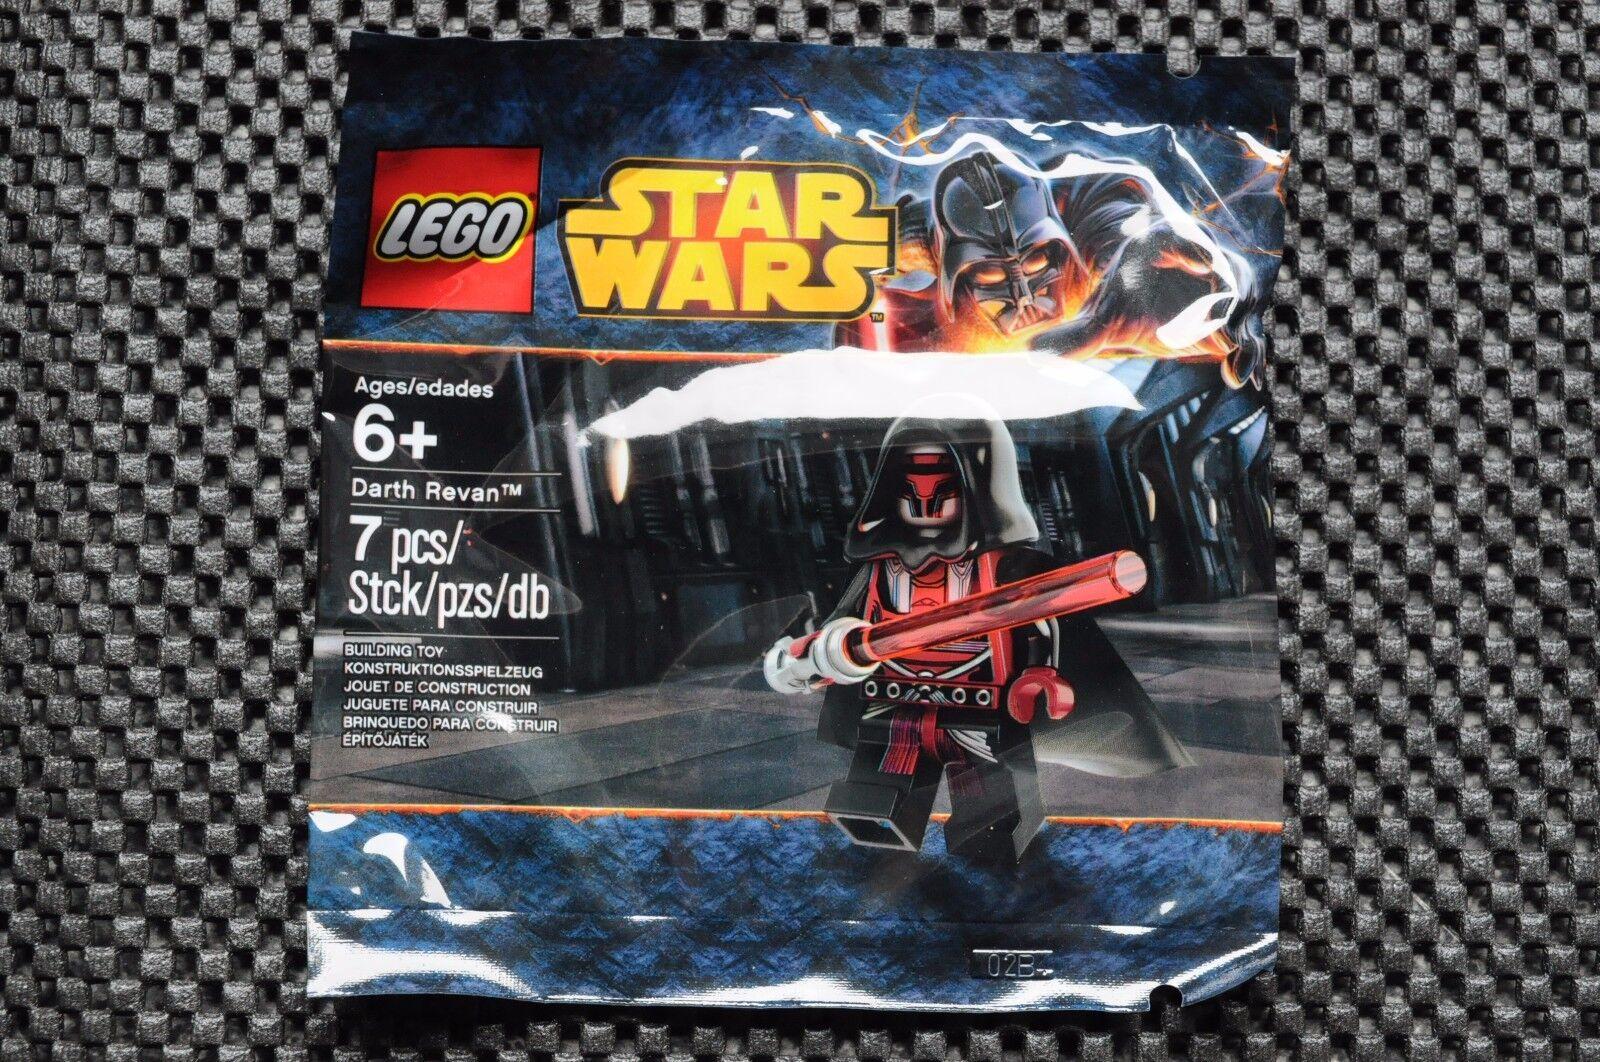 LEGO Star Wars Darth Revan Minifigure 5002123 Polybag RARE